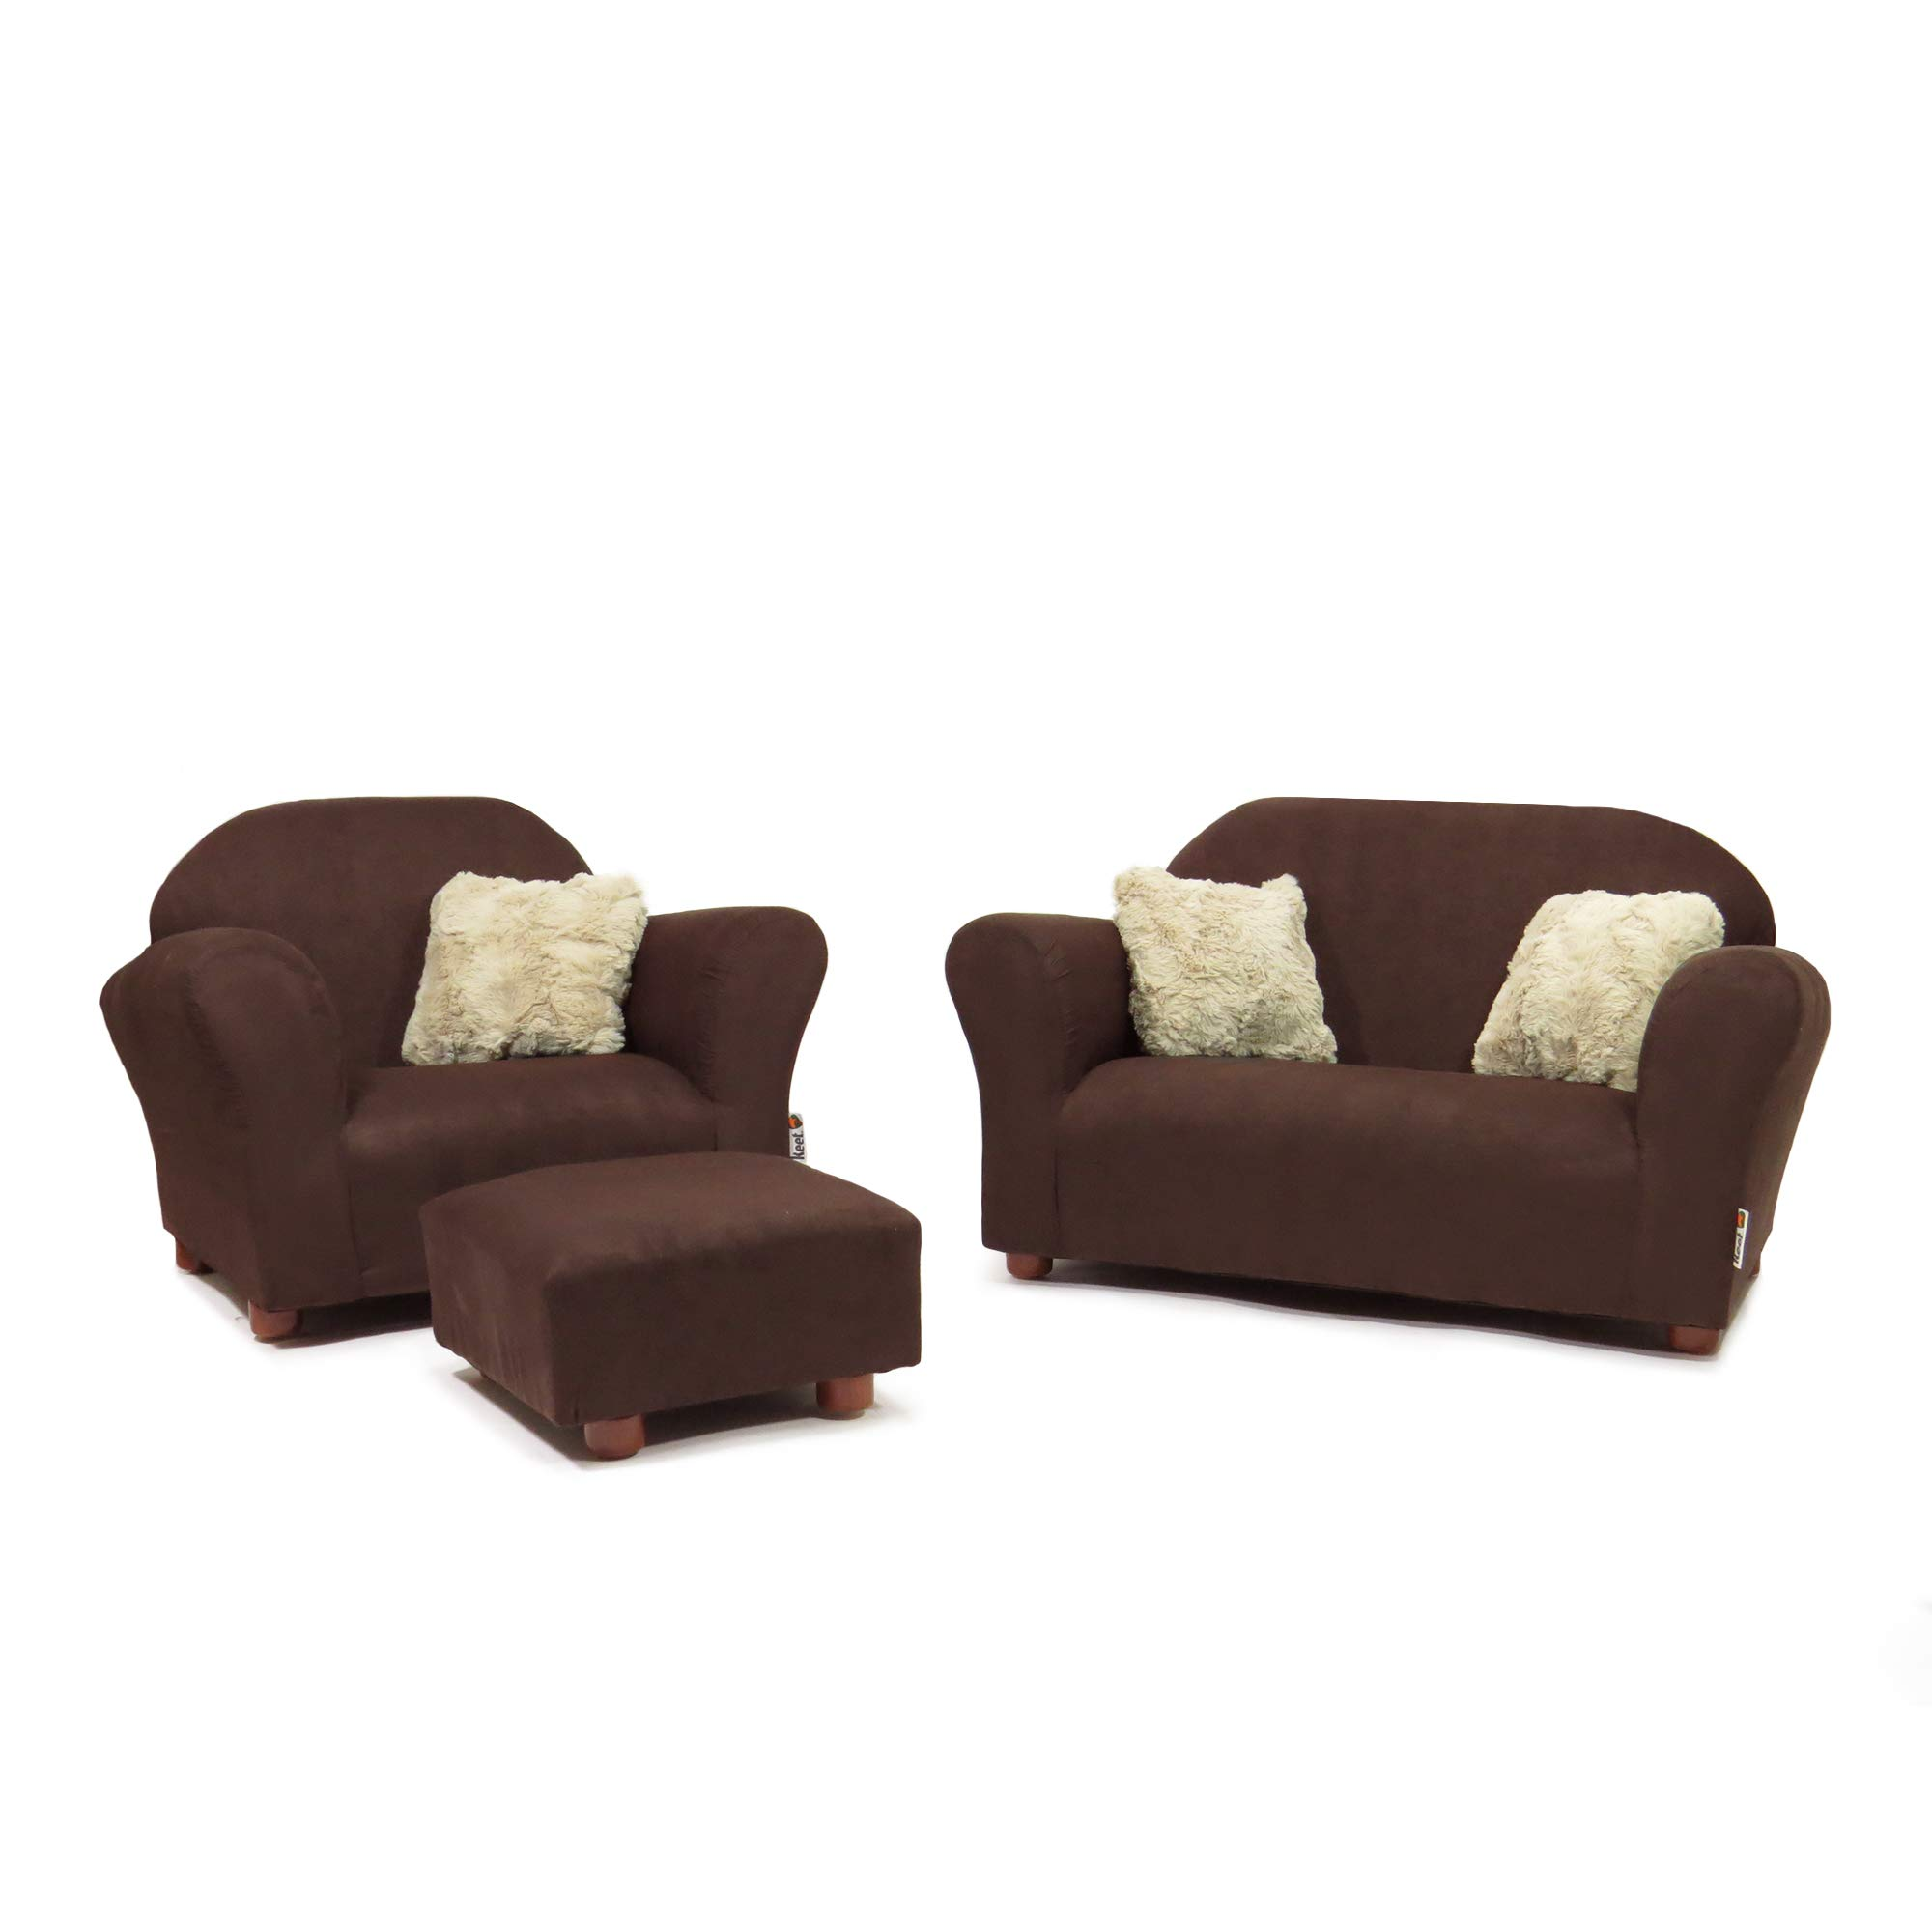 Keet Plush Childrens Set, Sofa, Chair and Ottoman, Brown by Keet